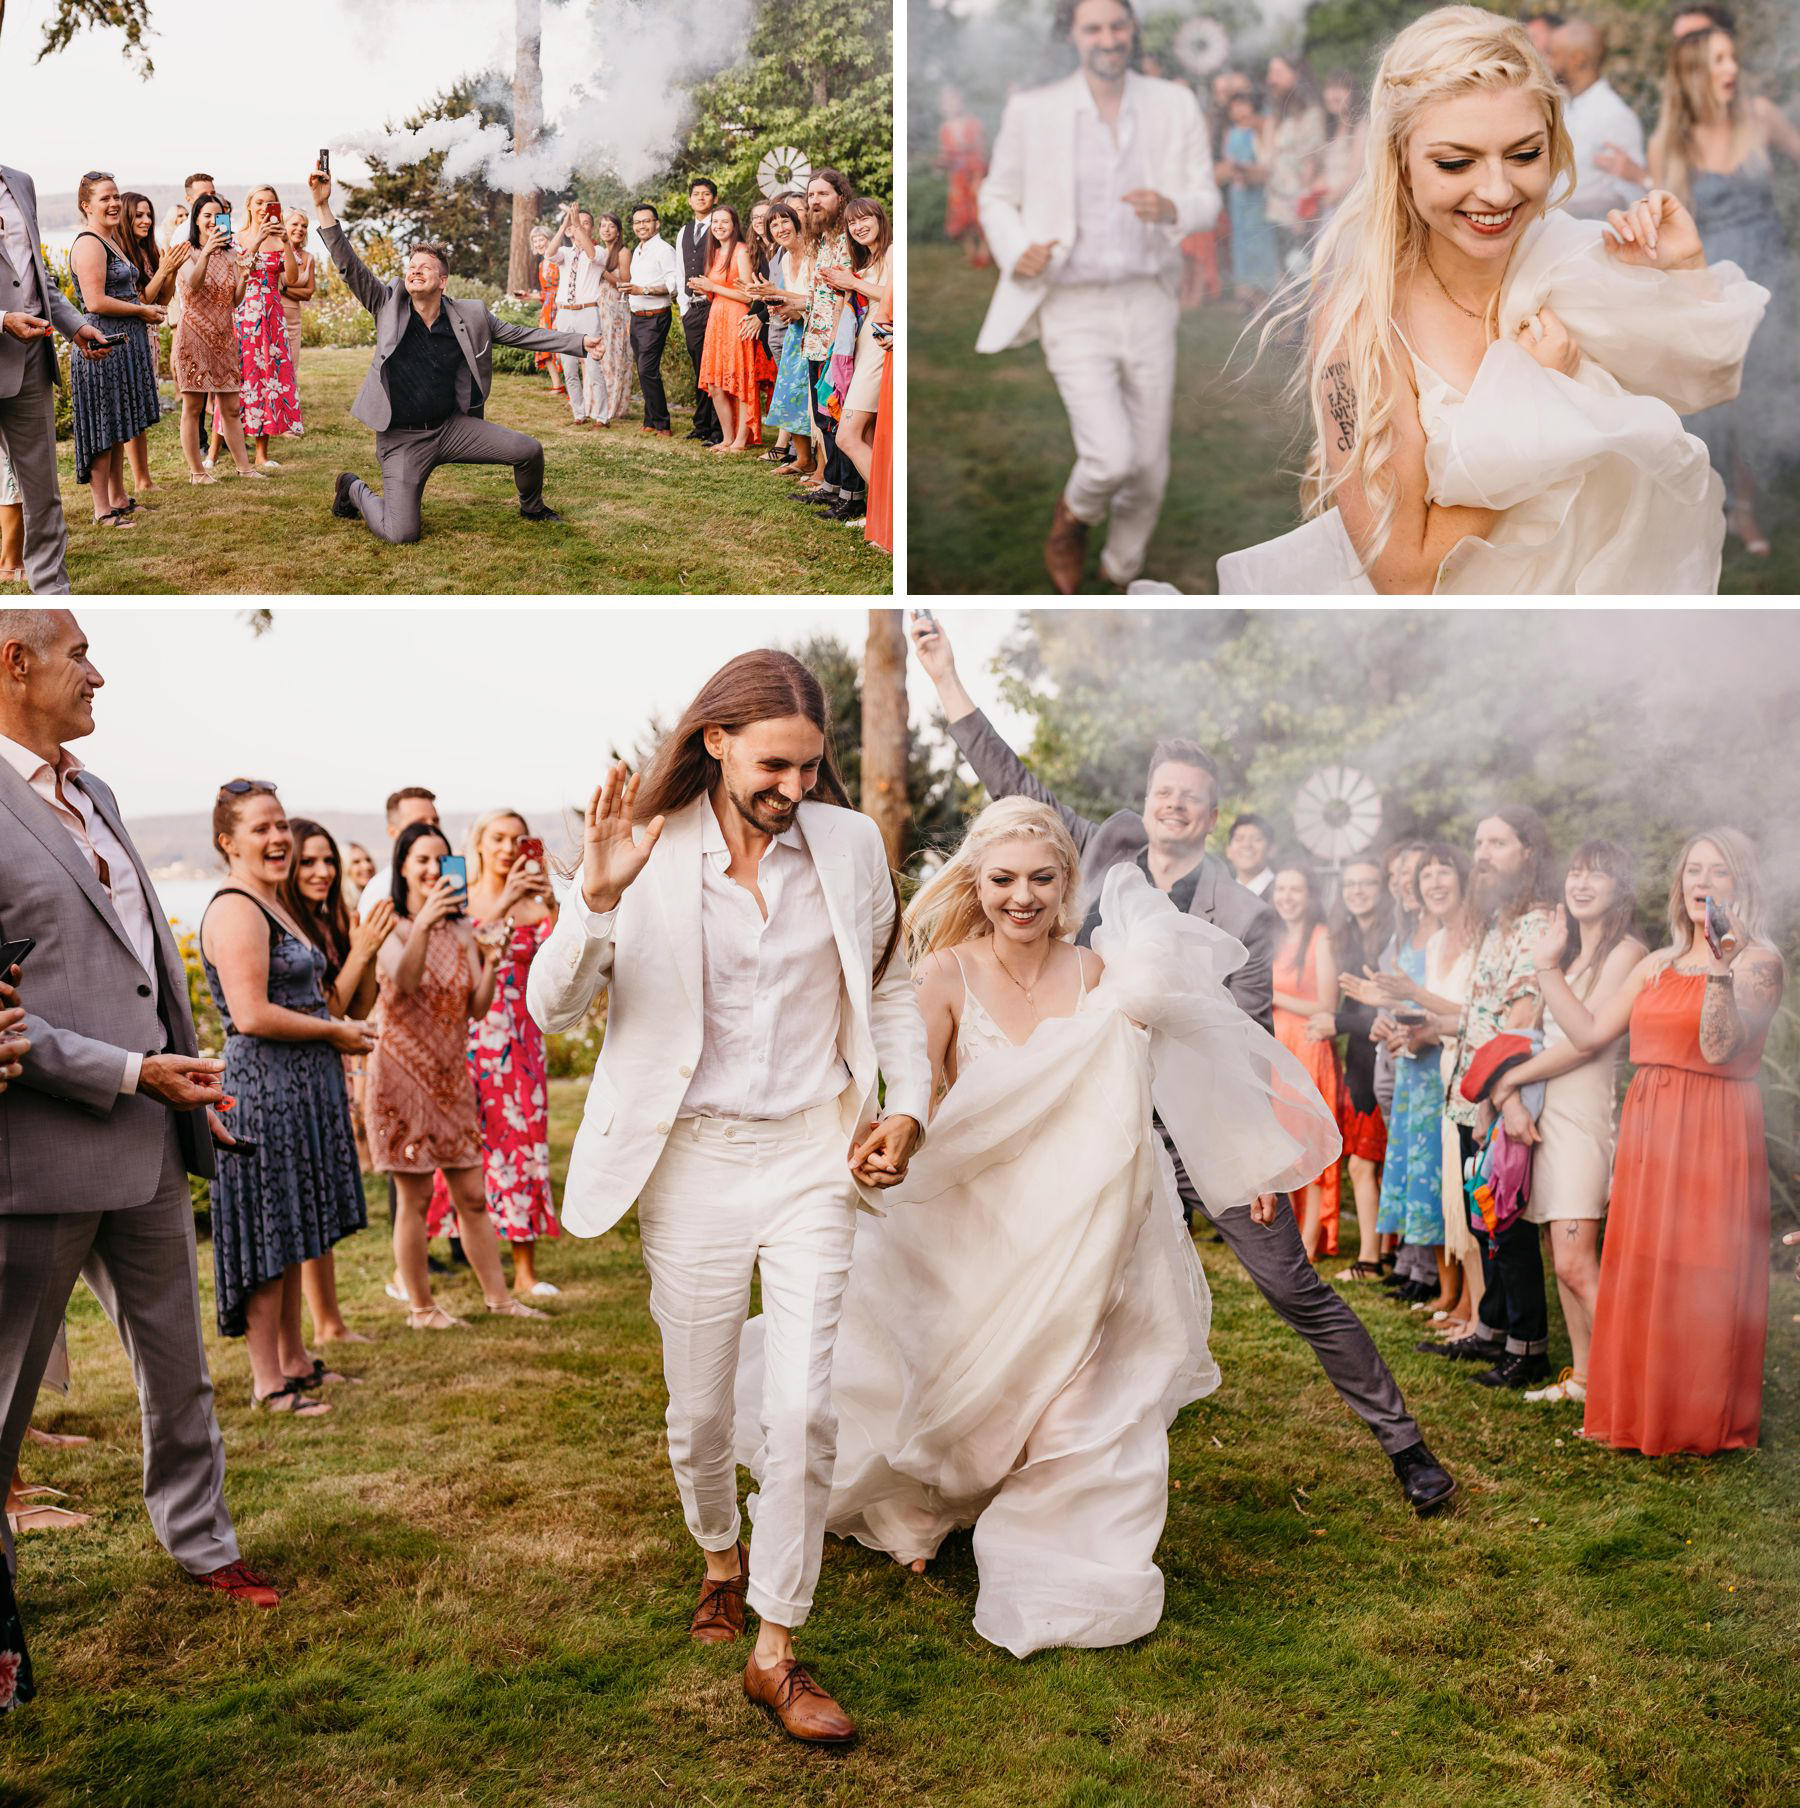 deception pass wedding bluff on whidbey